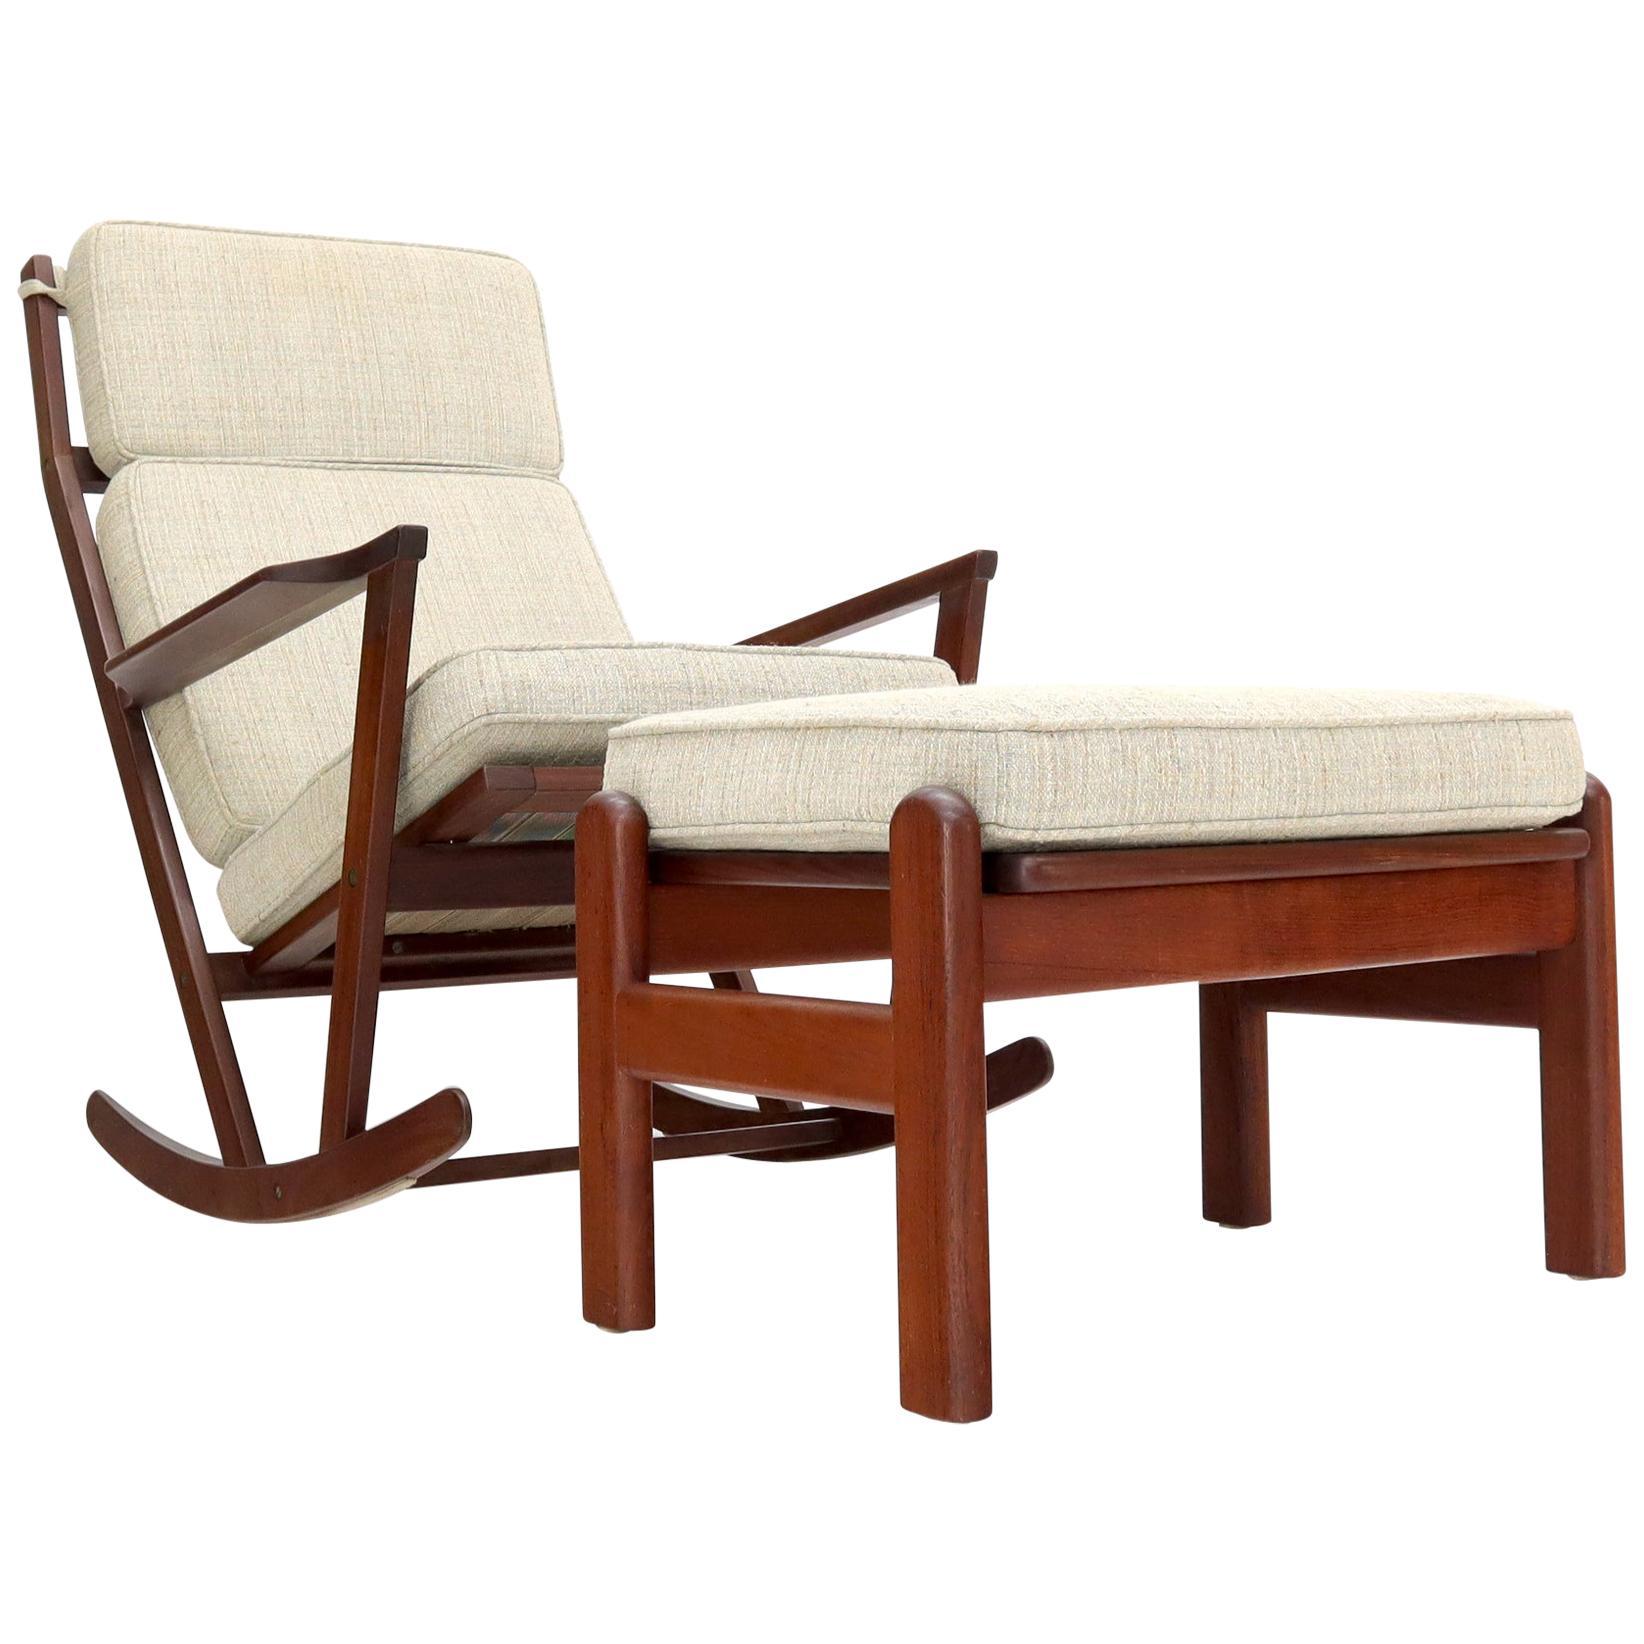 Danish Teak Mid-Century Modern Lounge Rocking Chair with Ottoman